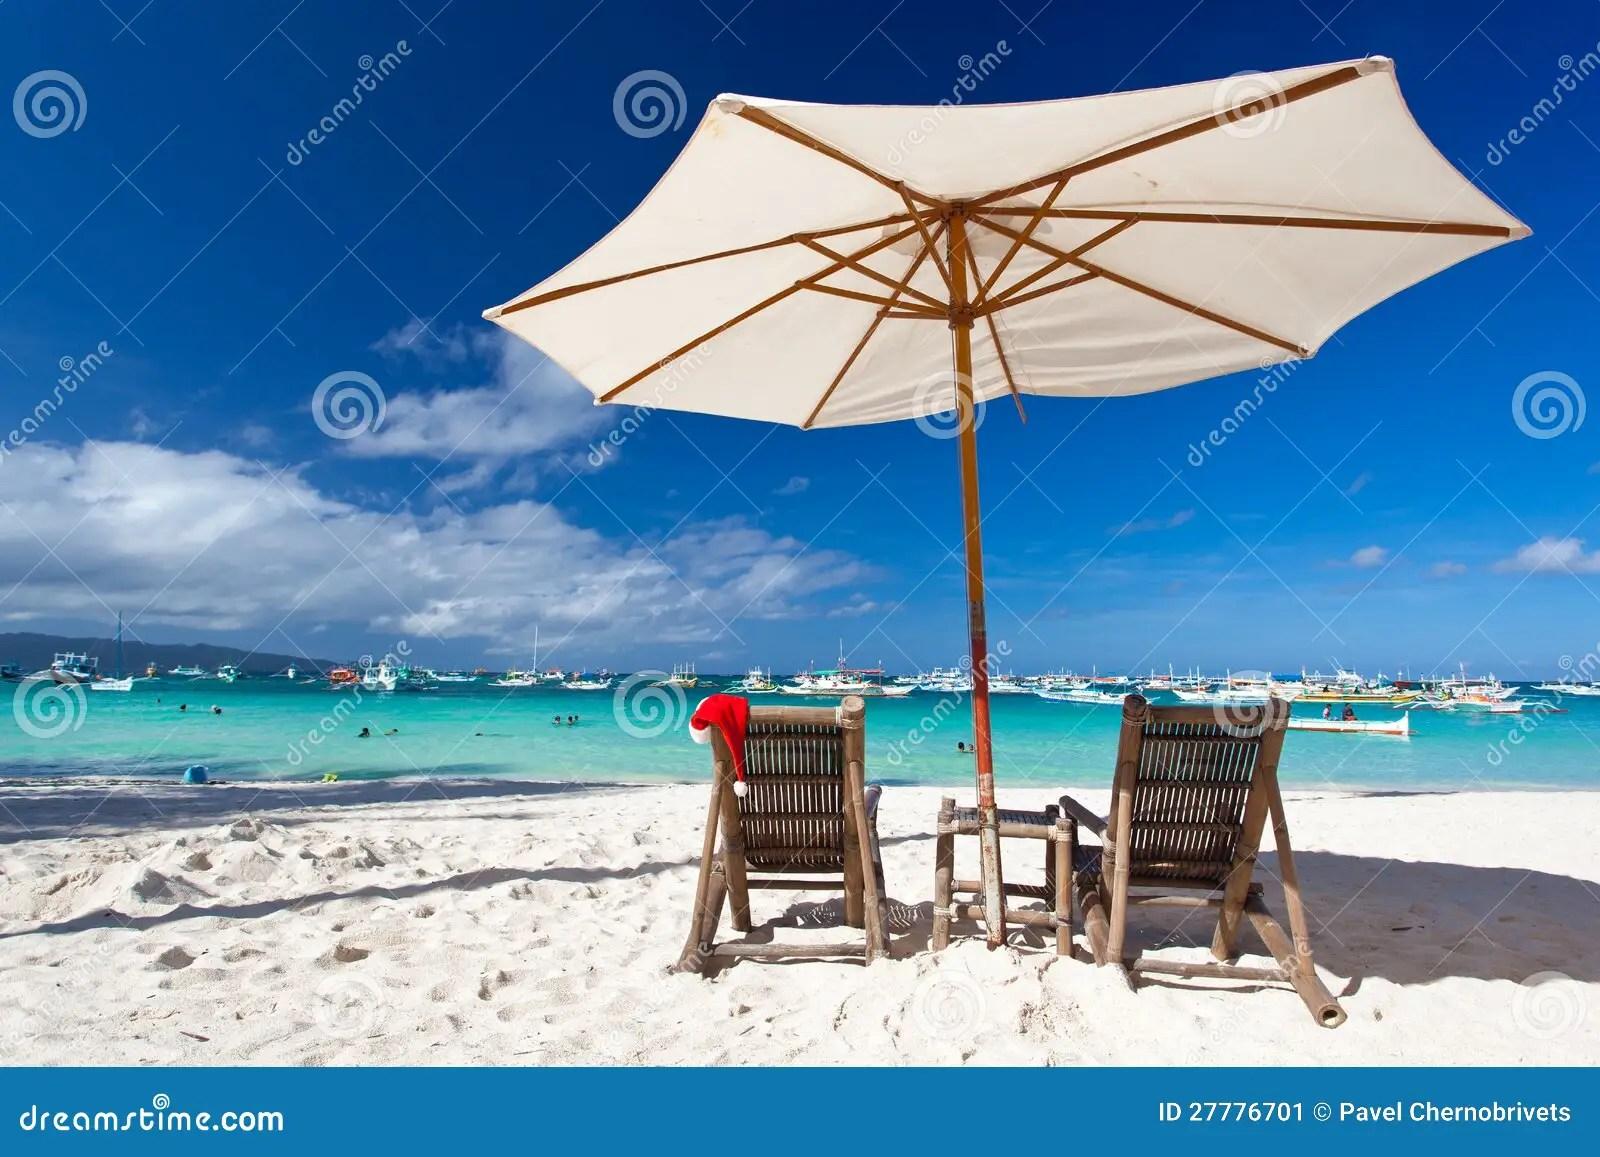 Sun Umbrella With Santa Hat On Chair Stock Image Image